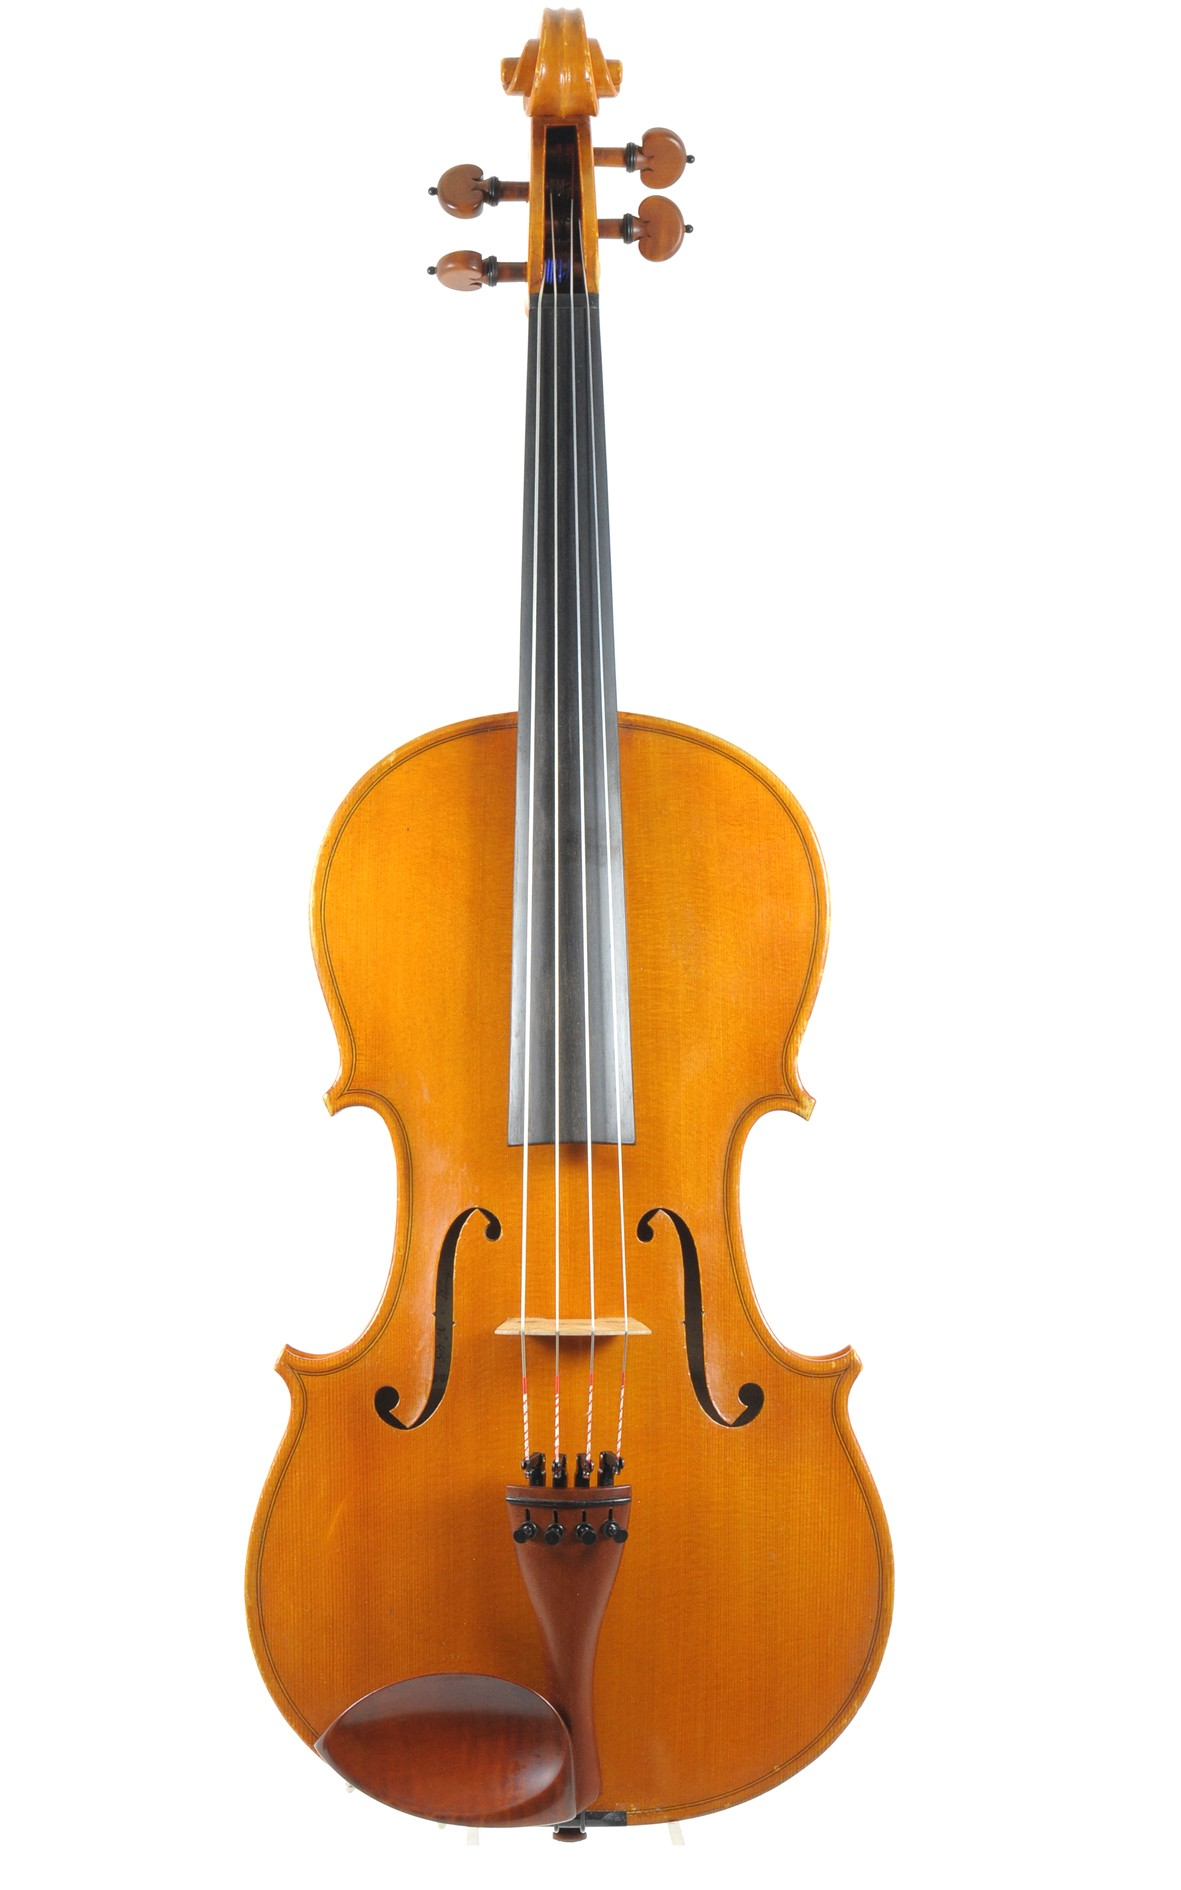 Jan Kudanowski, Italian viola, Cremona, Viola No. 45 - top